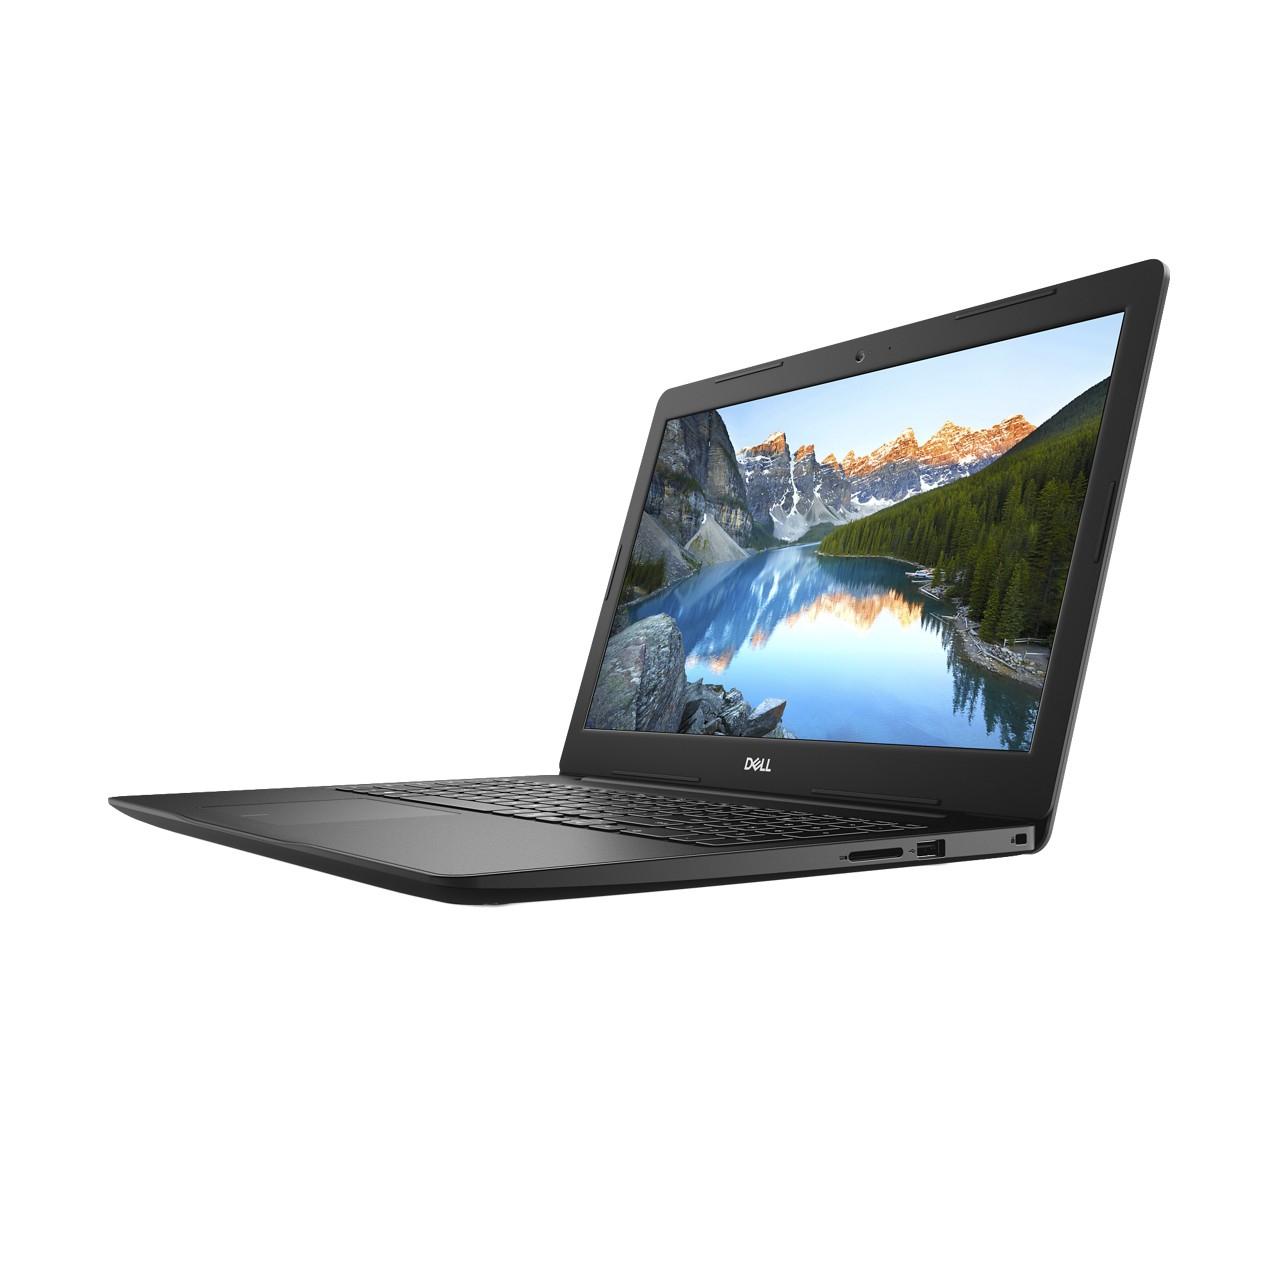 Notebook Dell Inspiron 3584 Core I3 8130u Memoria 4gb Ssd 128gb Tela Led 15.6' Hd Sistema Linux